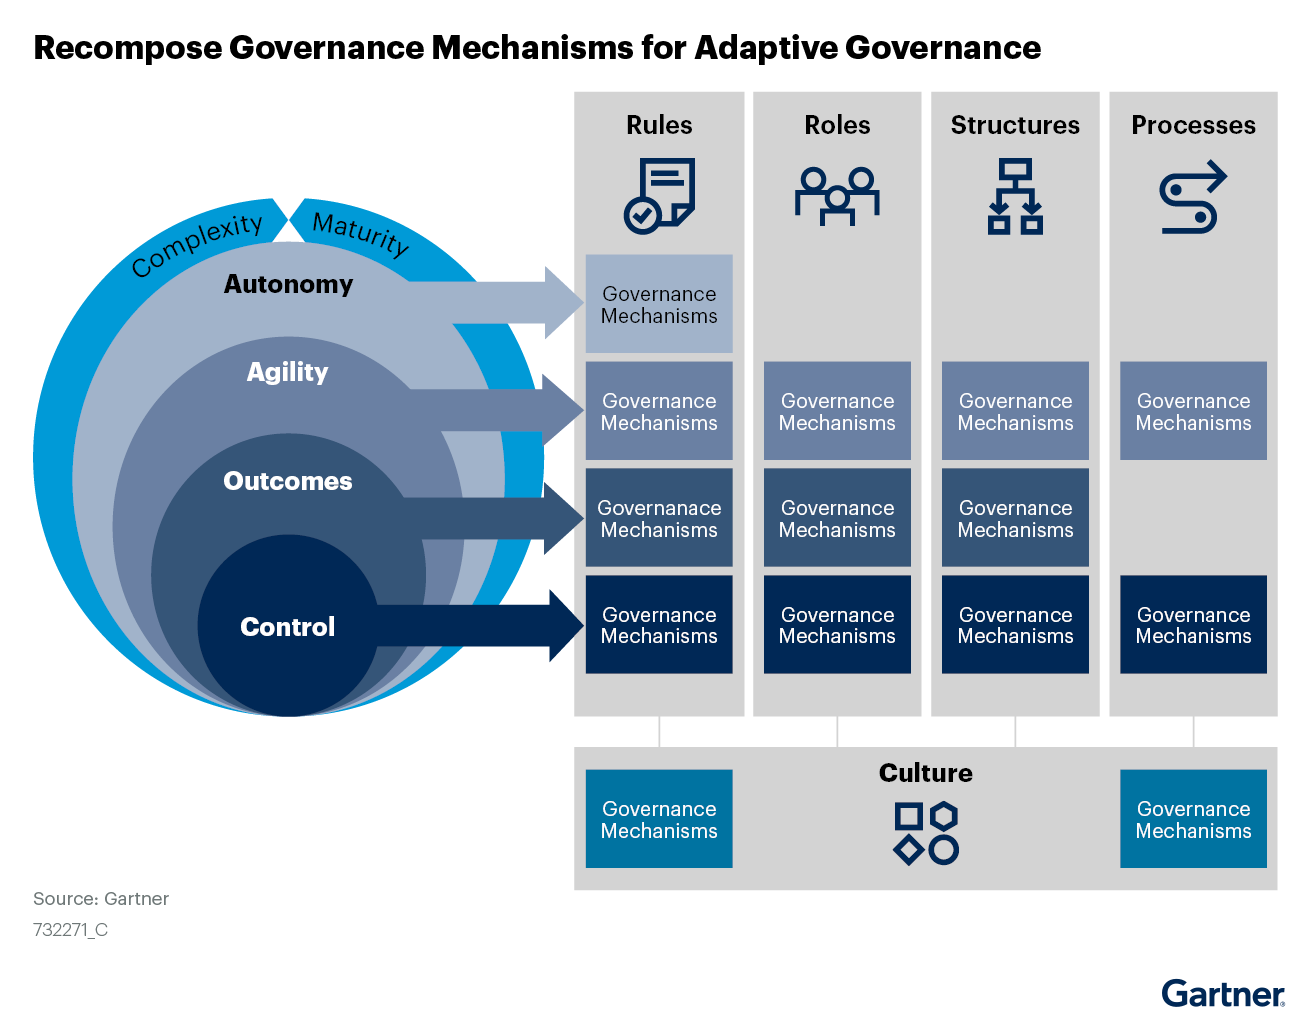 governance mechanisms